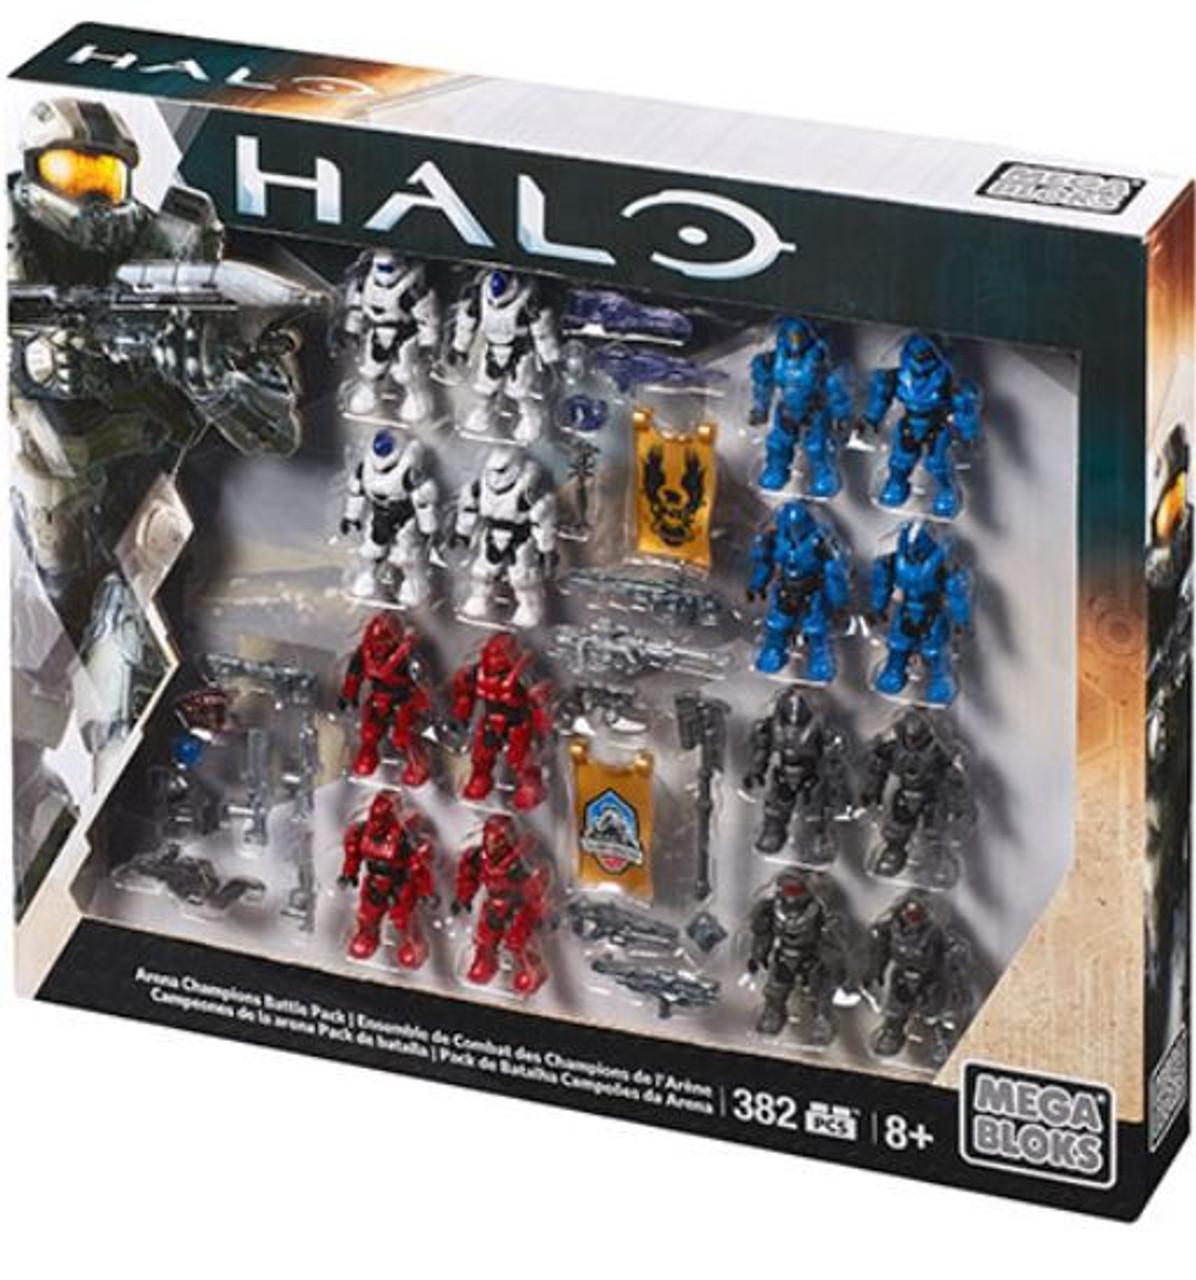 Mega Bloks Halo Arena Champions Battle Pack Exclusive Set